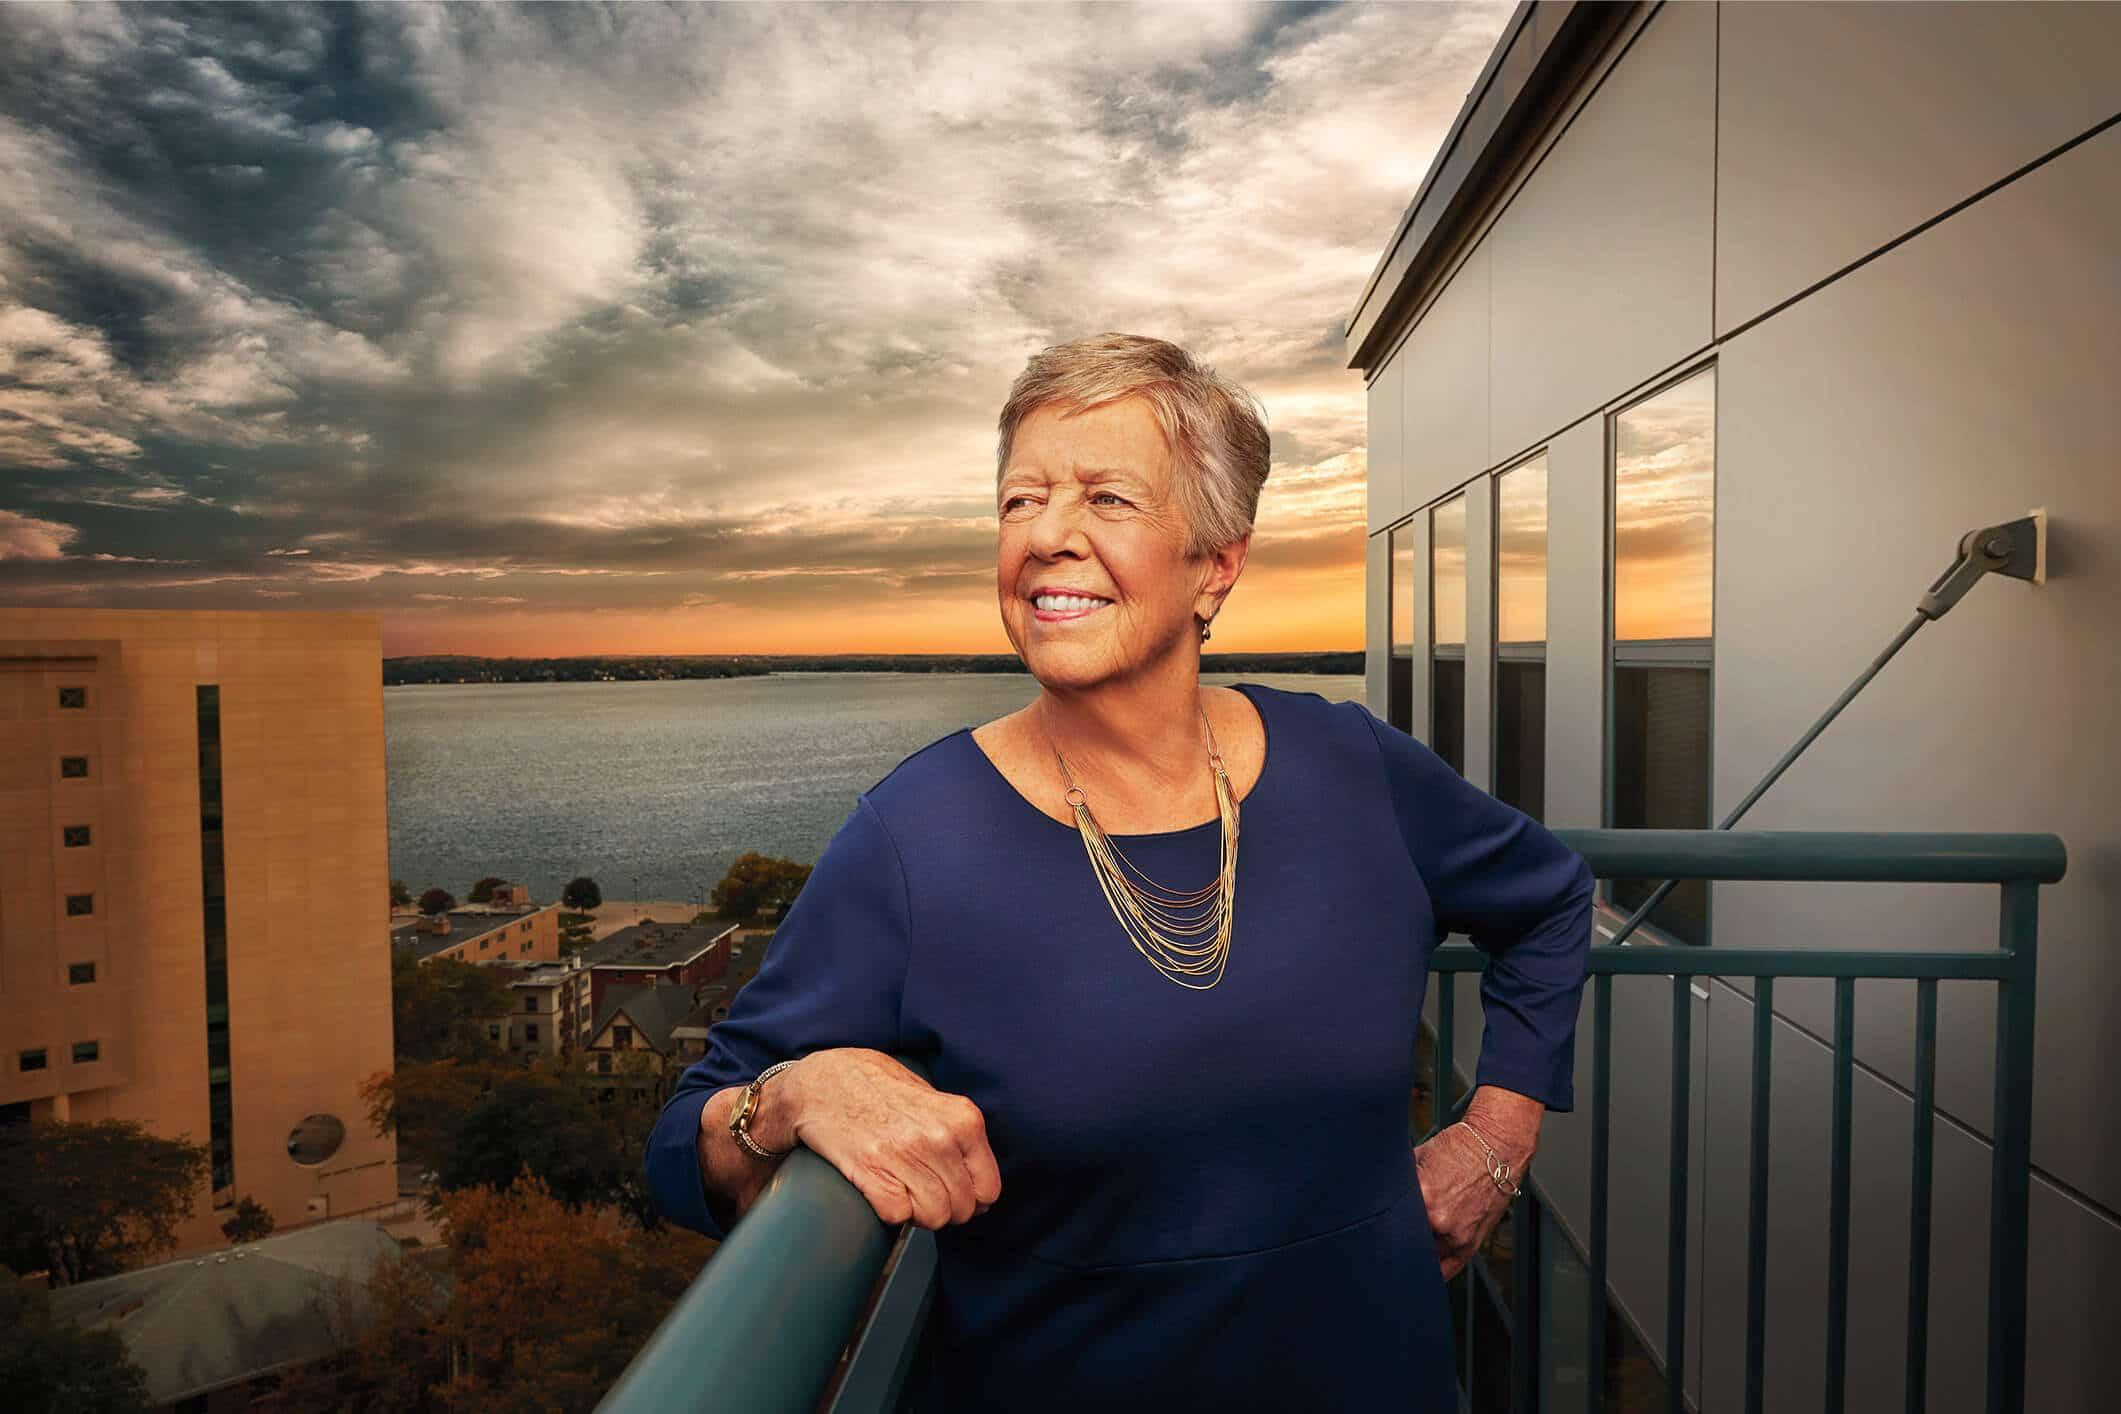 Capitol Lakes Retirement Senior Living